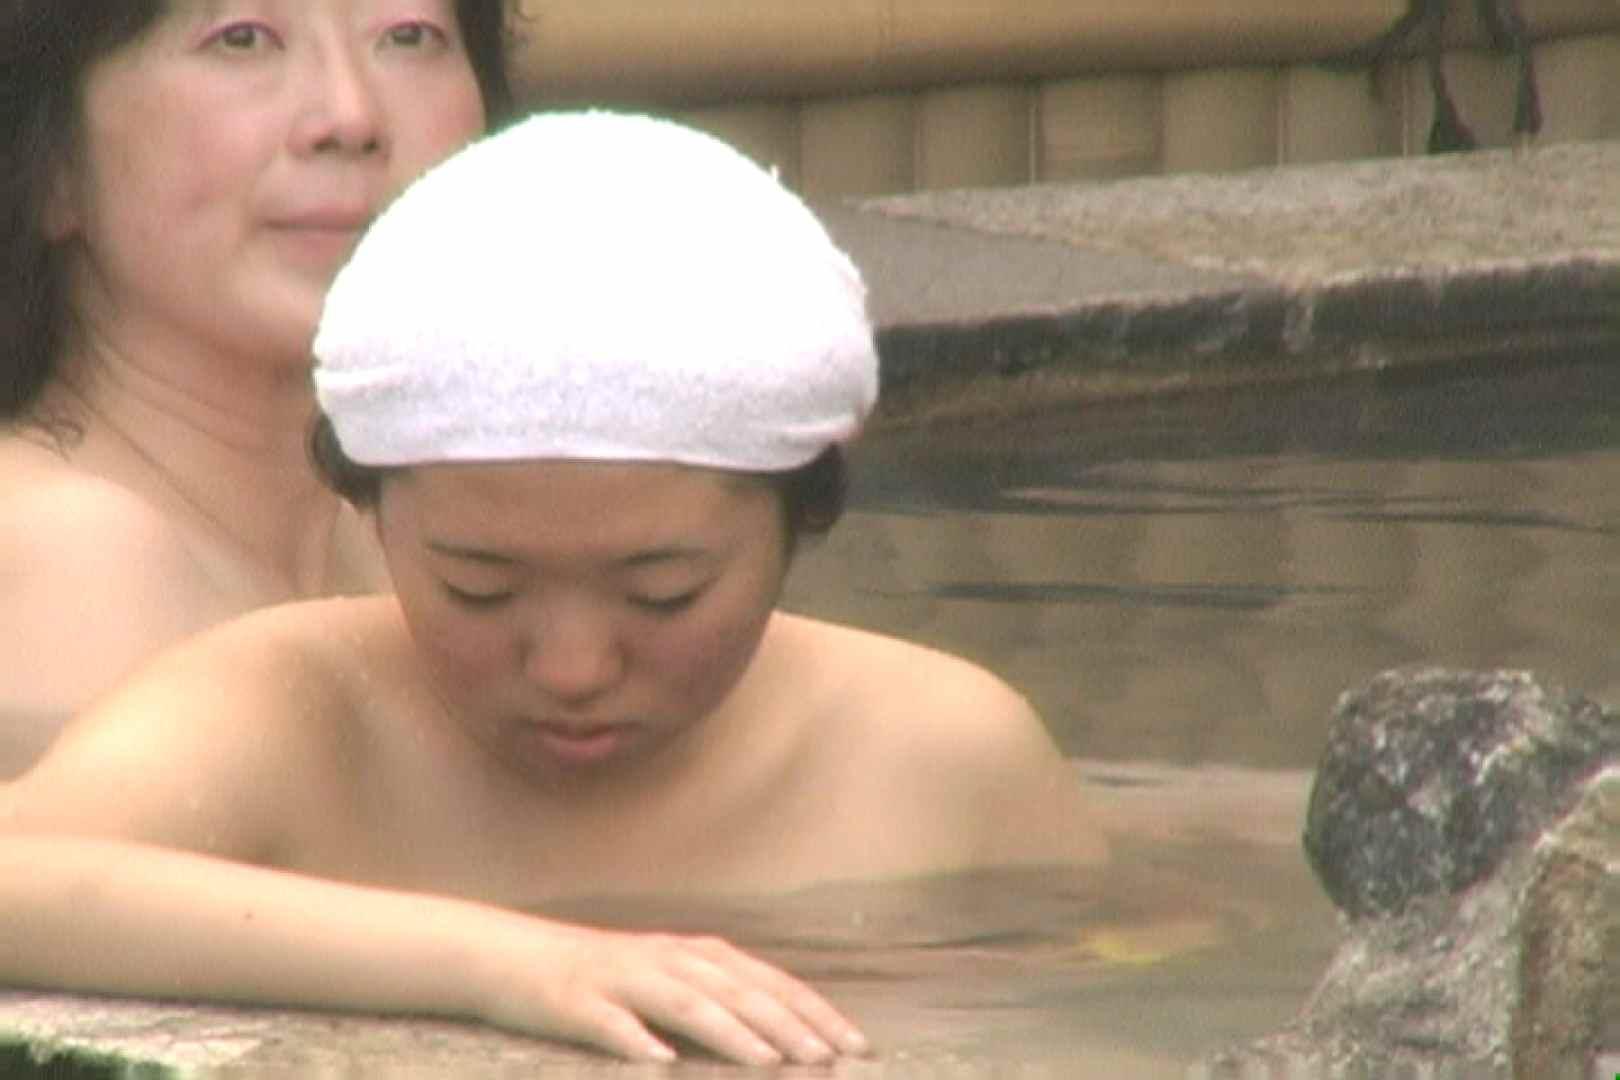 Aquaな露天風呂Vol.627 OLセックス 盗撮オメコ無修正動画無料 55画像 23